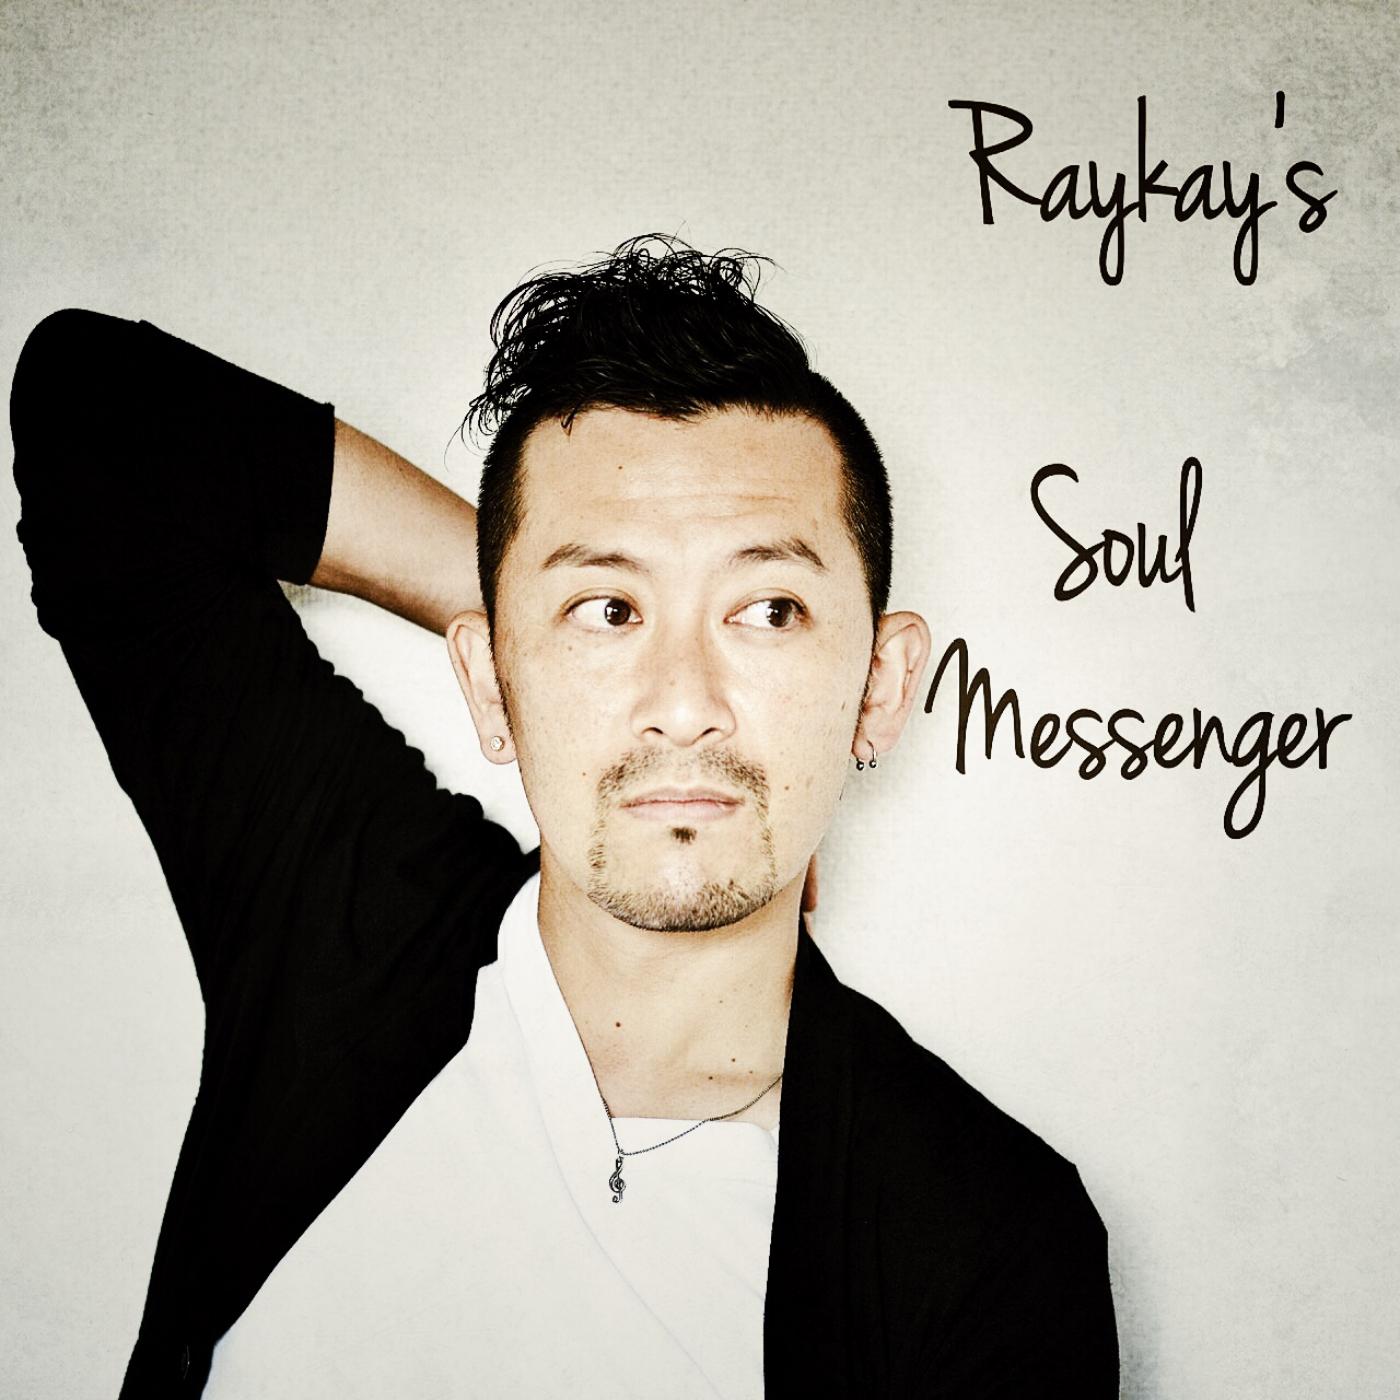 Raykay's Soul Messenger